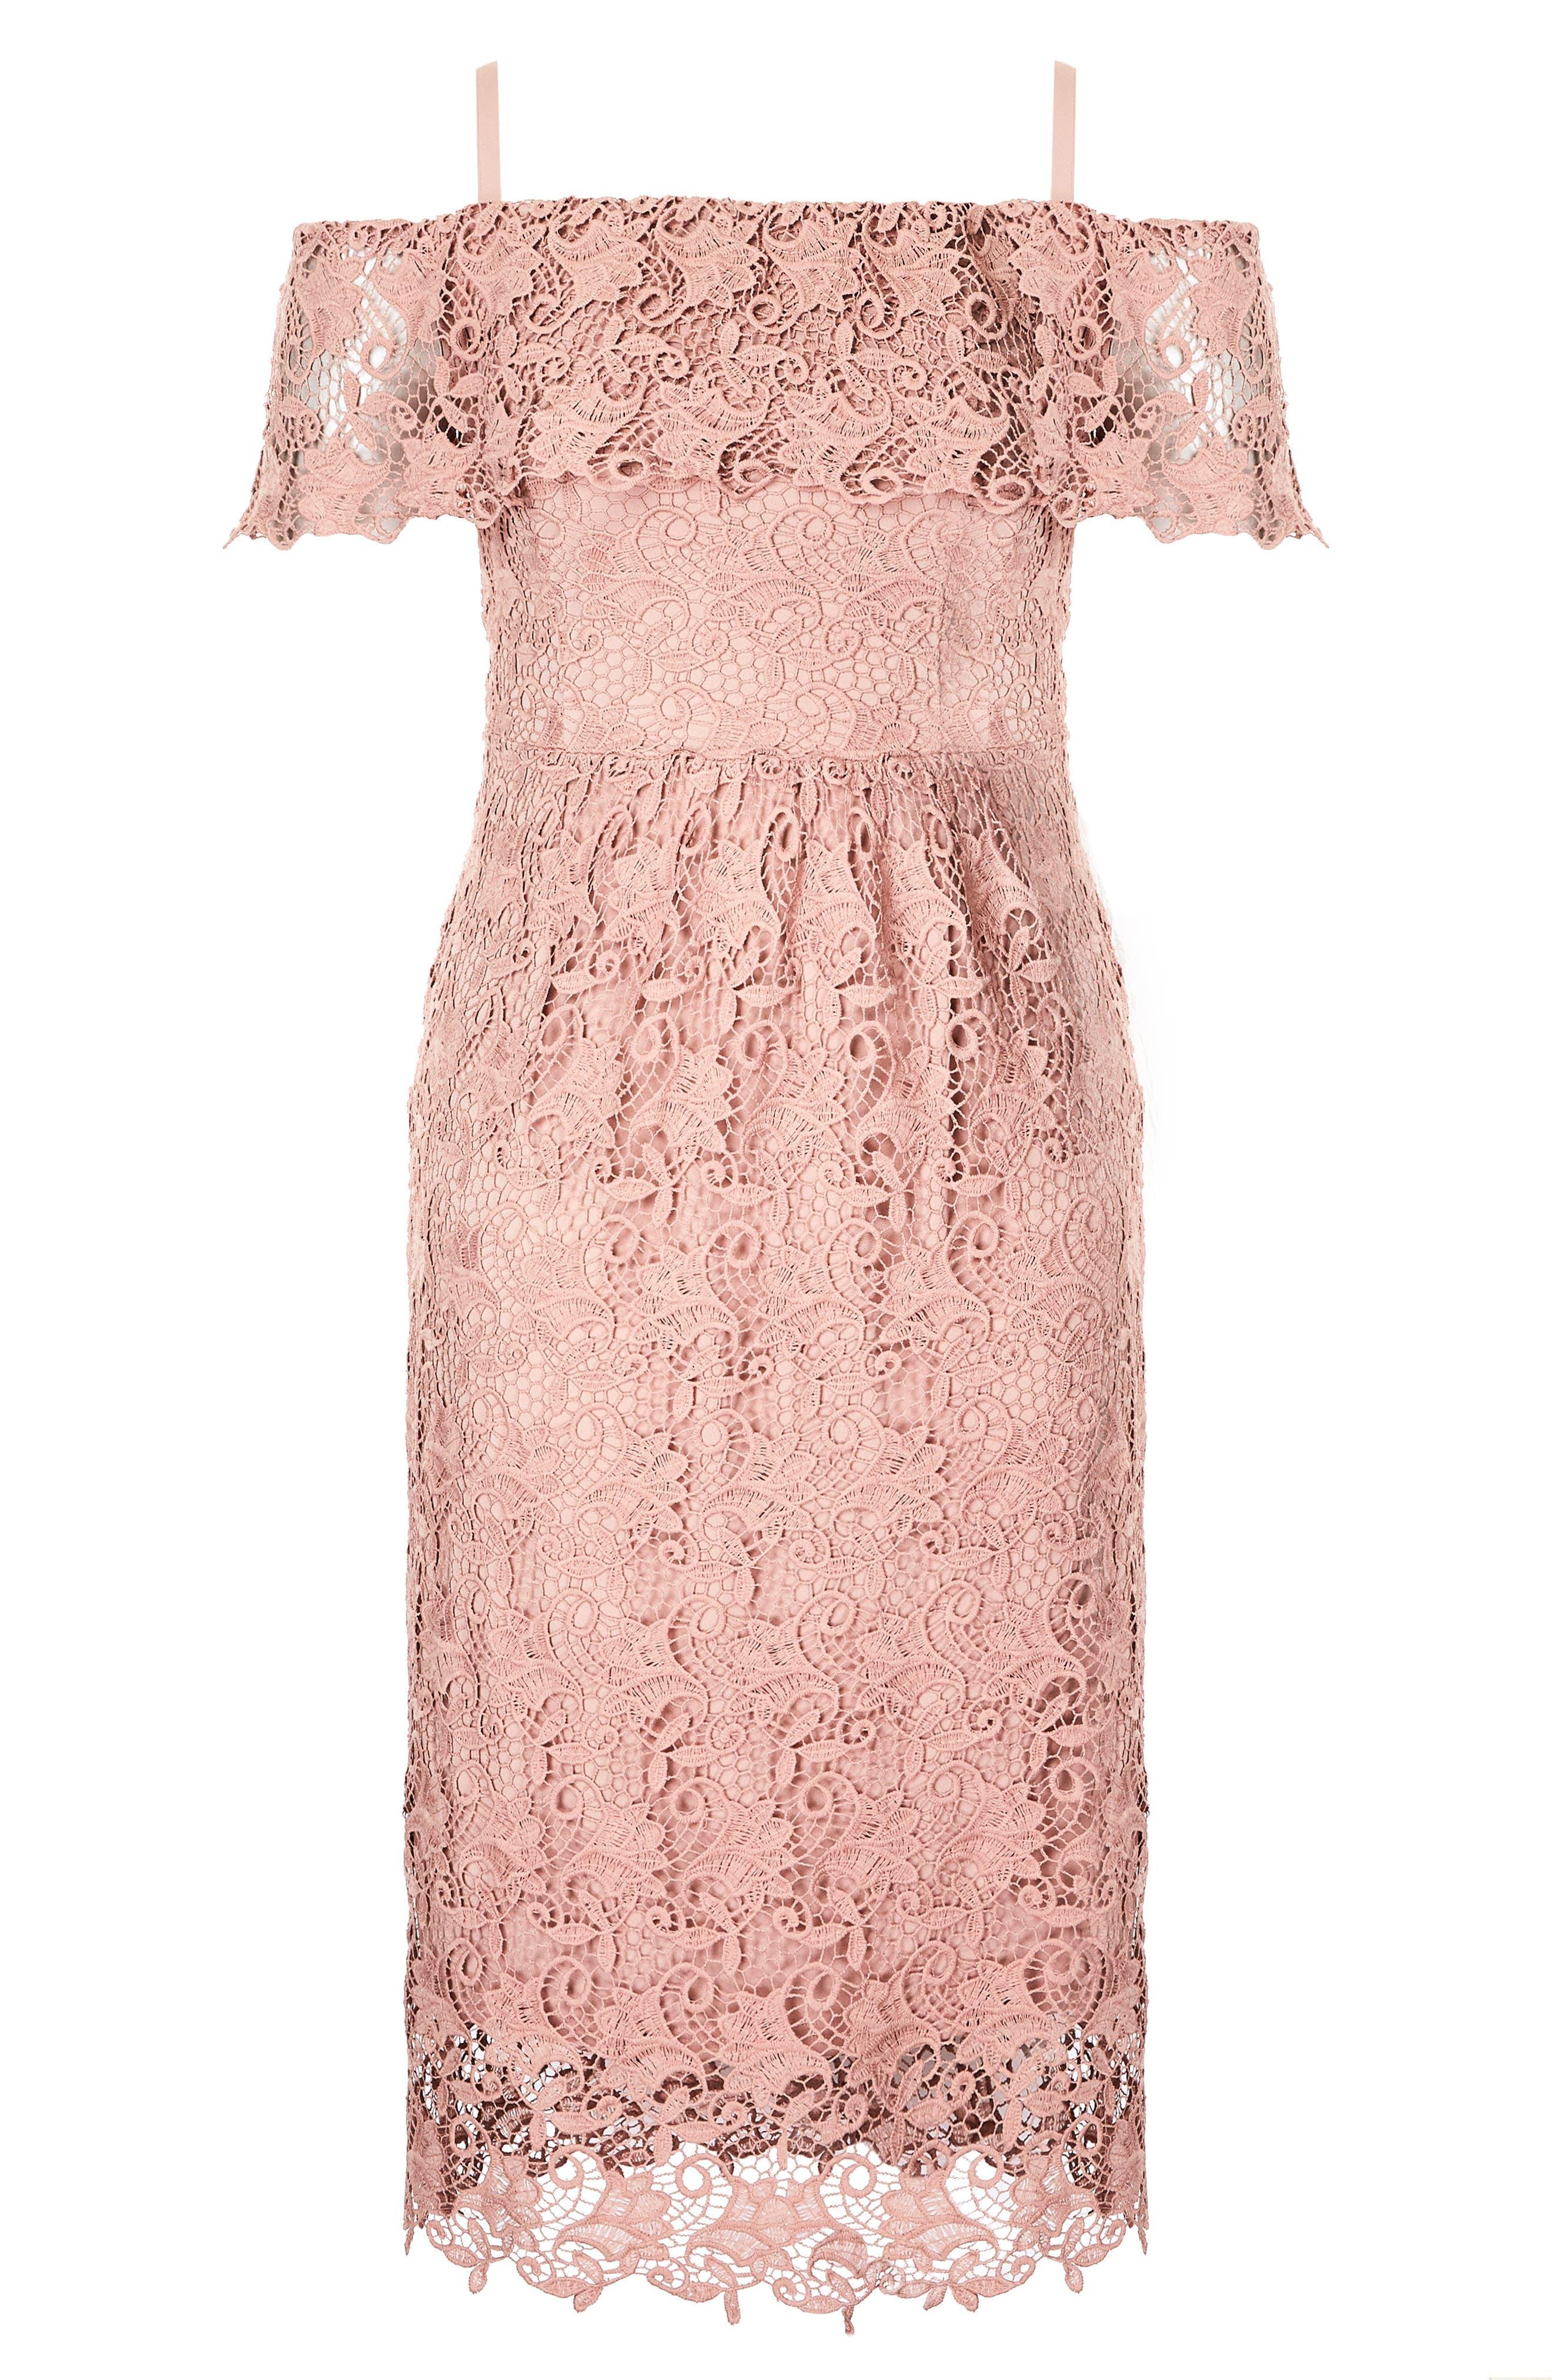 Spring Day Off the Shoulder Lace Sheath Dress,                             Alternate thumbnail 3, color,                             Ballet Pink